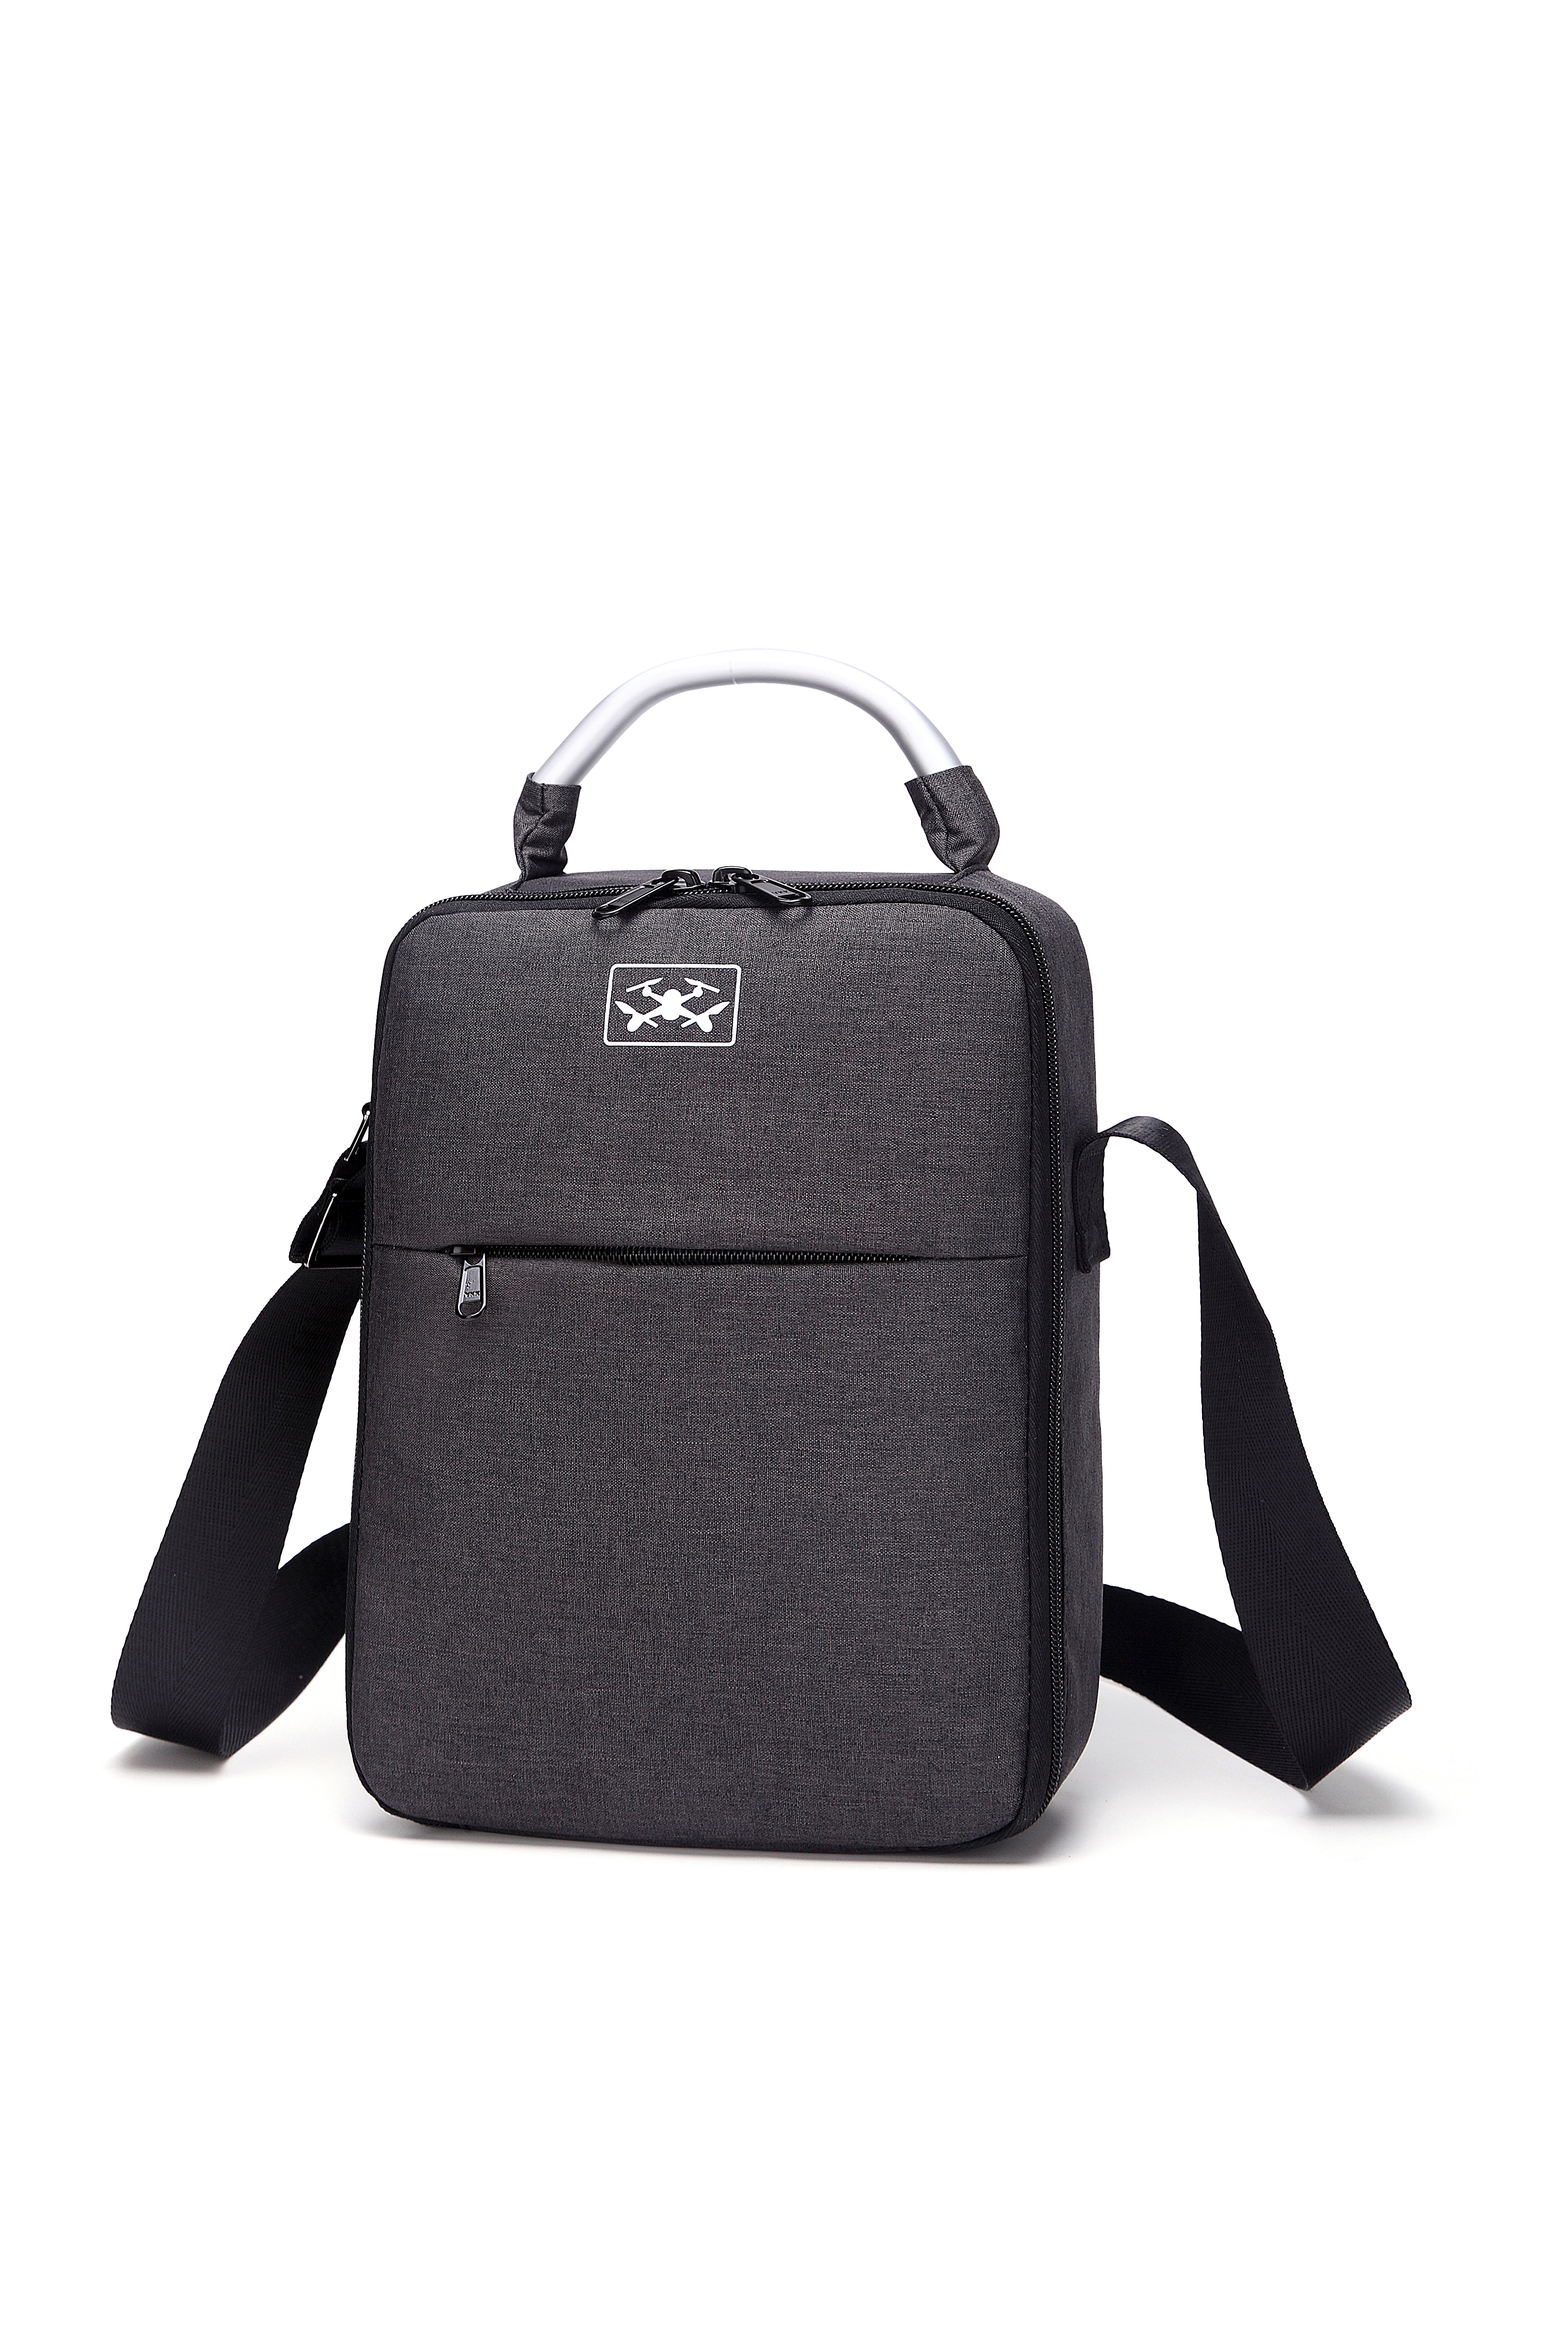 Portable Storage Bag Waterproof Travel Case Carring Shoulder Bag for DJI Mavic Air/Mavic 2 Pro Drone black